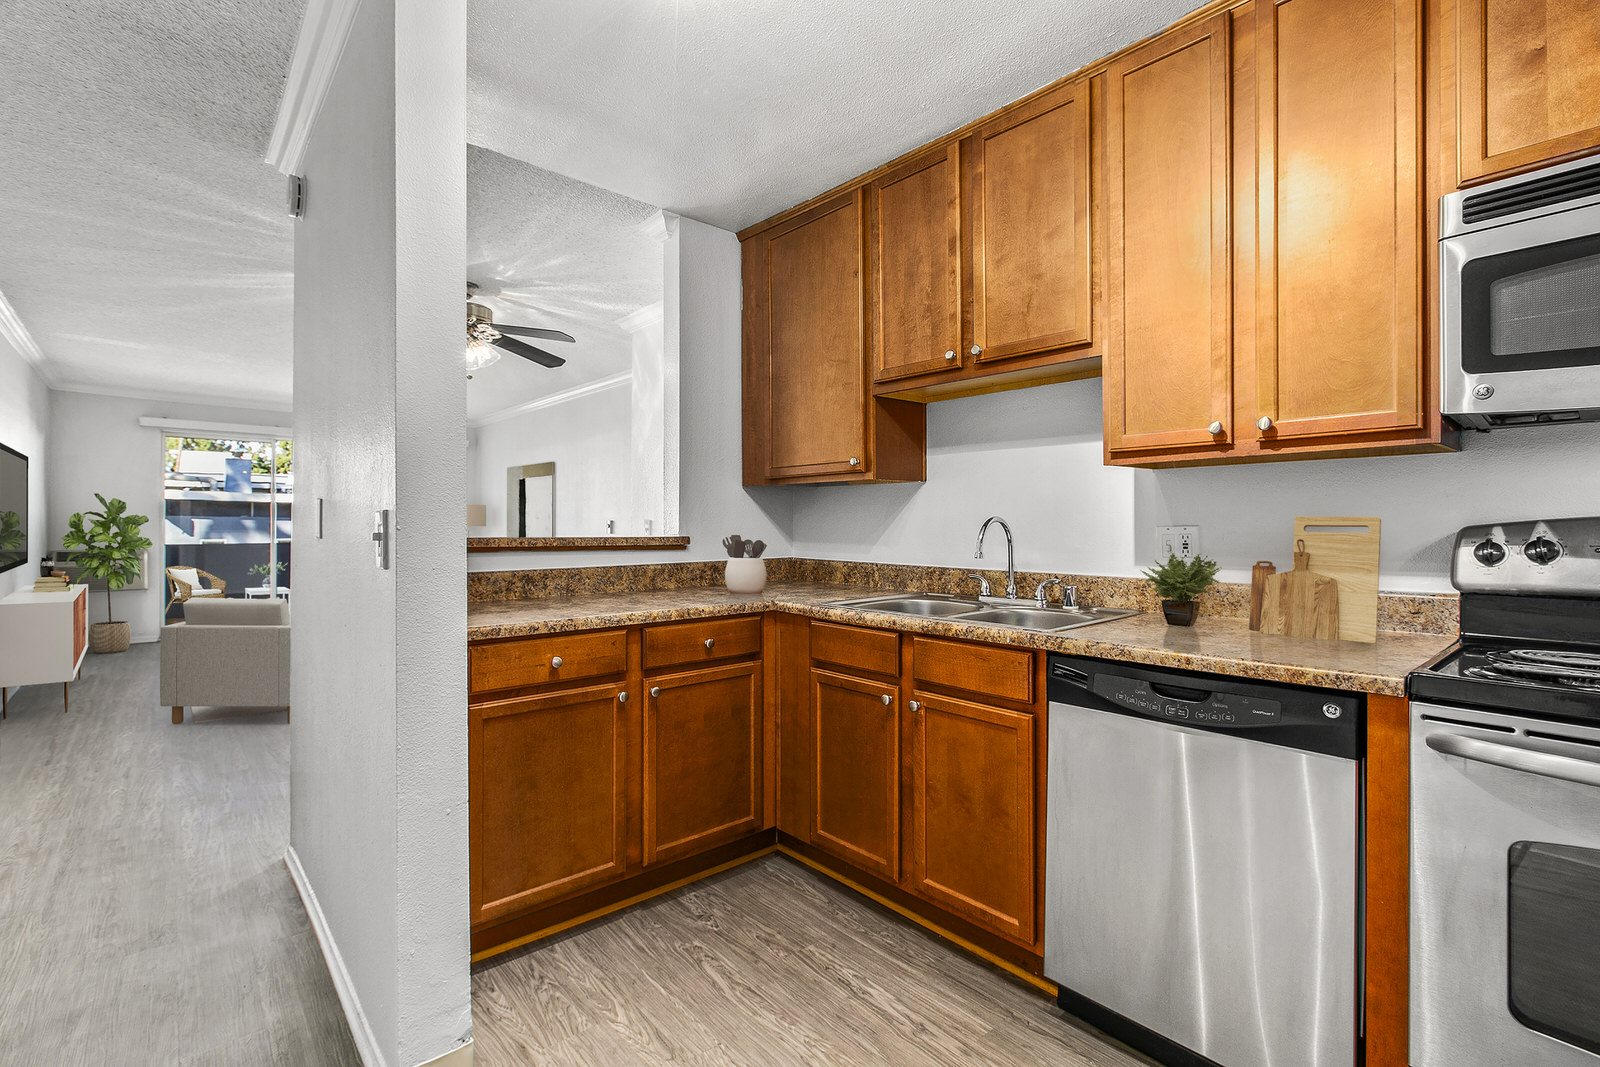 Interior Photo at Milano Apartments 20900 Anza Ave Torrance, CA 90503